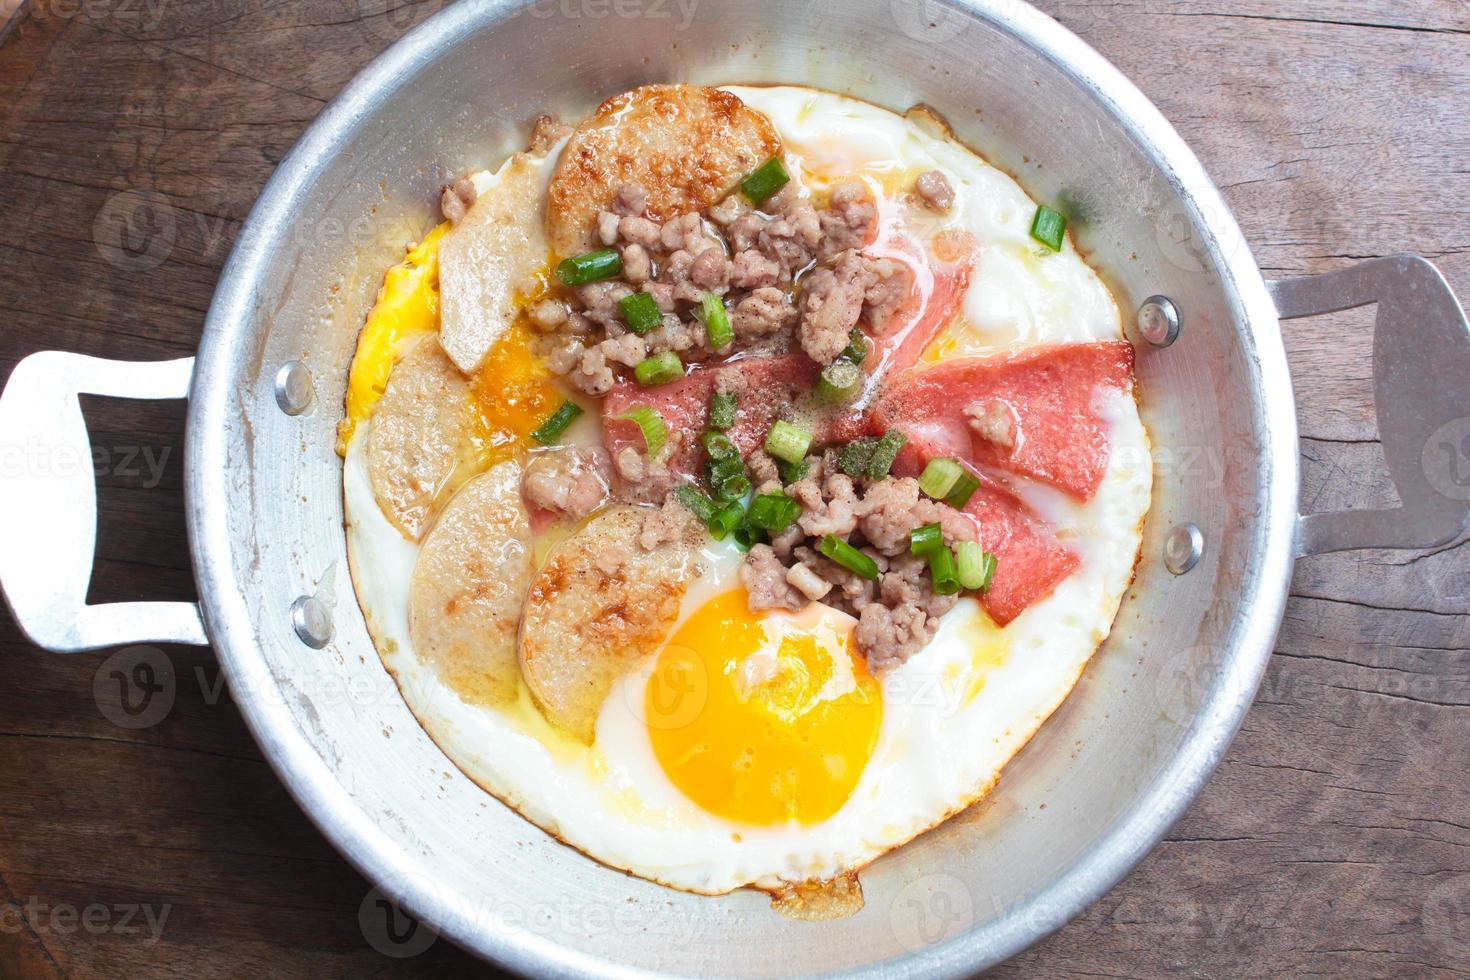 casserole d'oeufs, petit déjeuner. photo